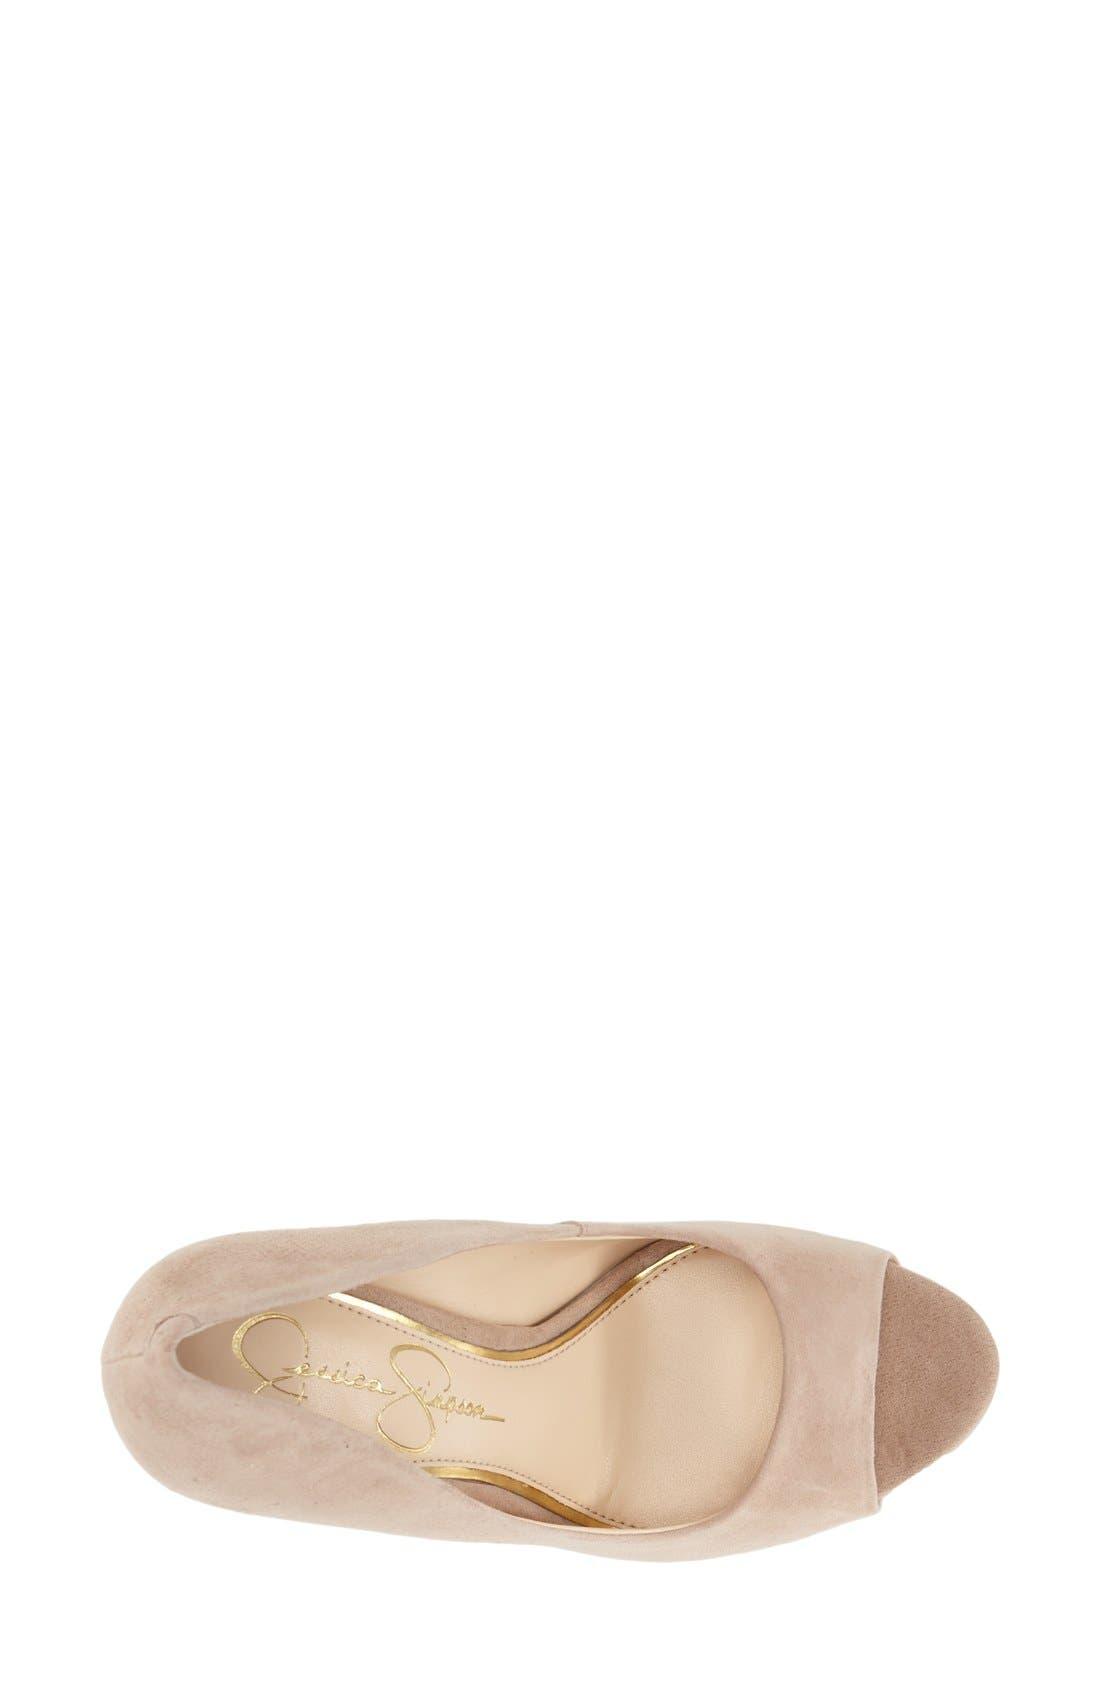 Alternate Image 3  - Jessica Simpson 'Bethani' Wedge Platform Sandal (Women)